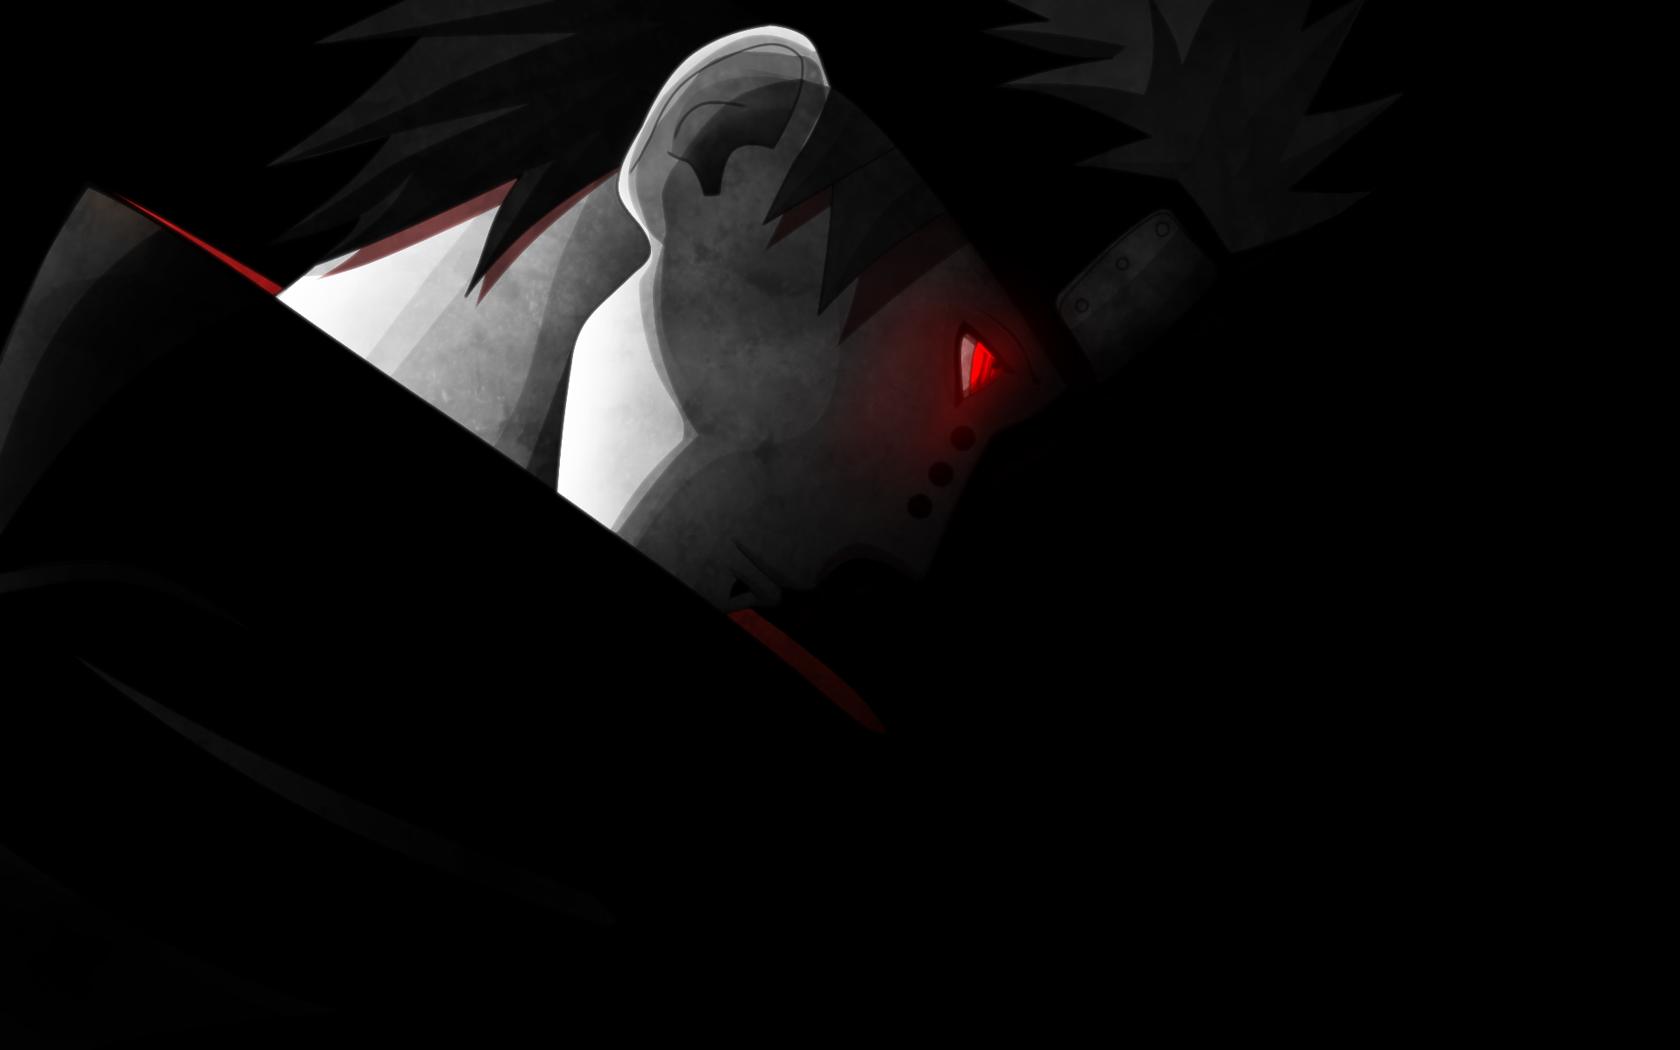 Wallpaper Naruto Shippuuden Pein Yahiko Glowing Eyes